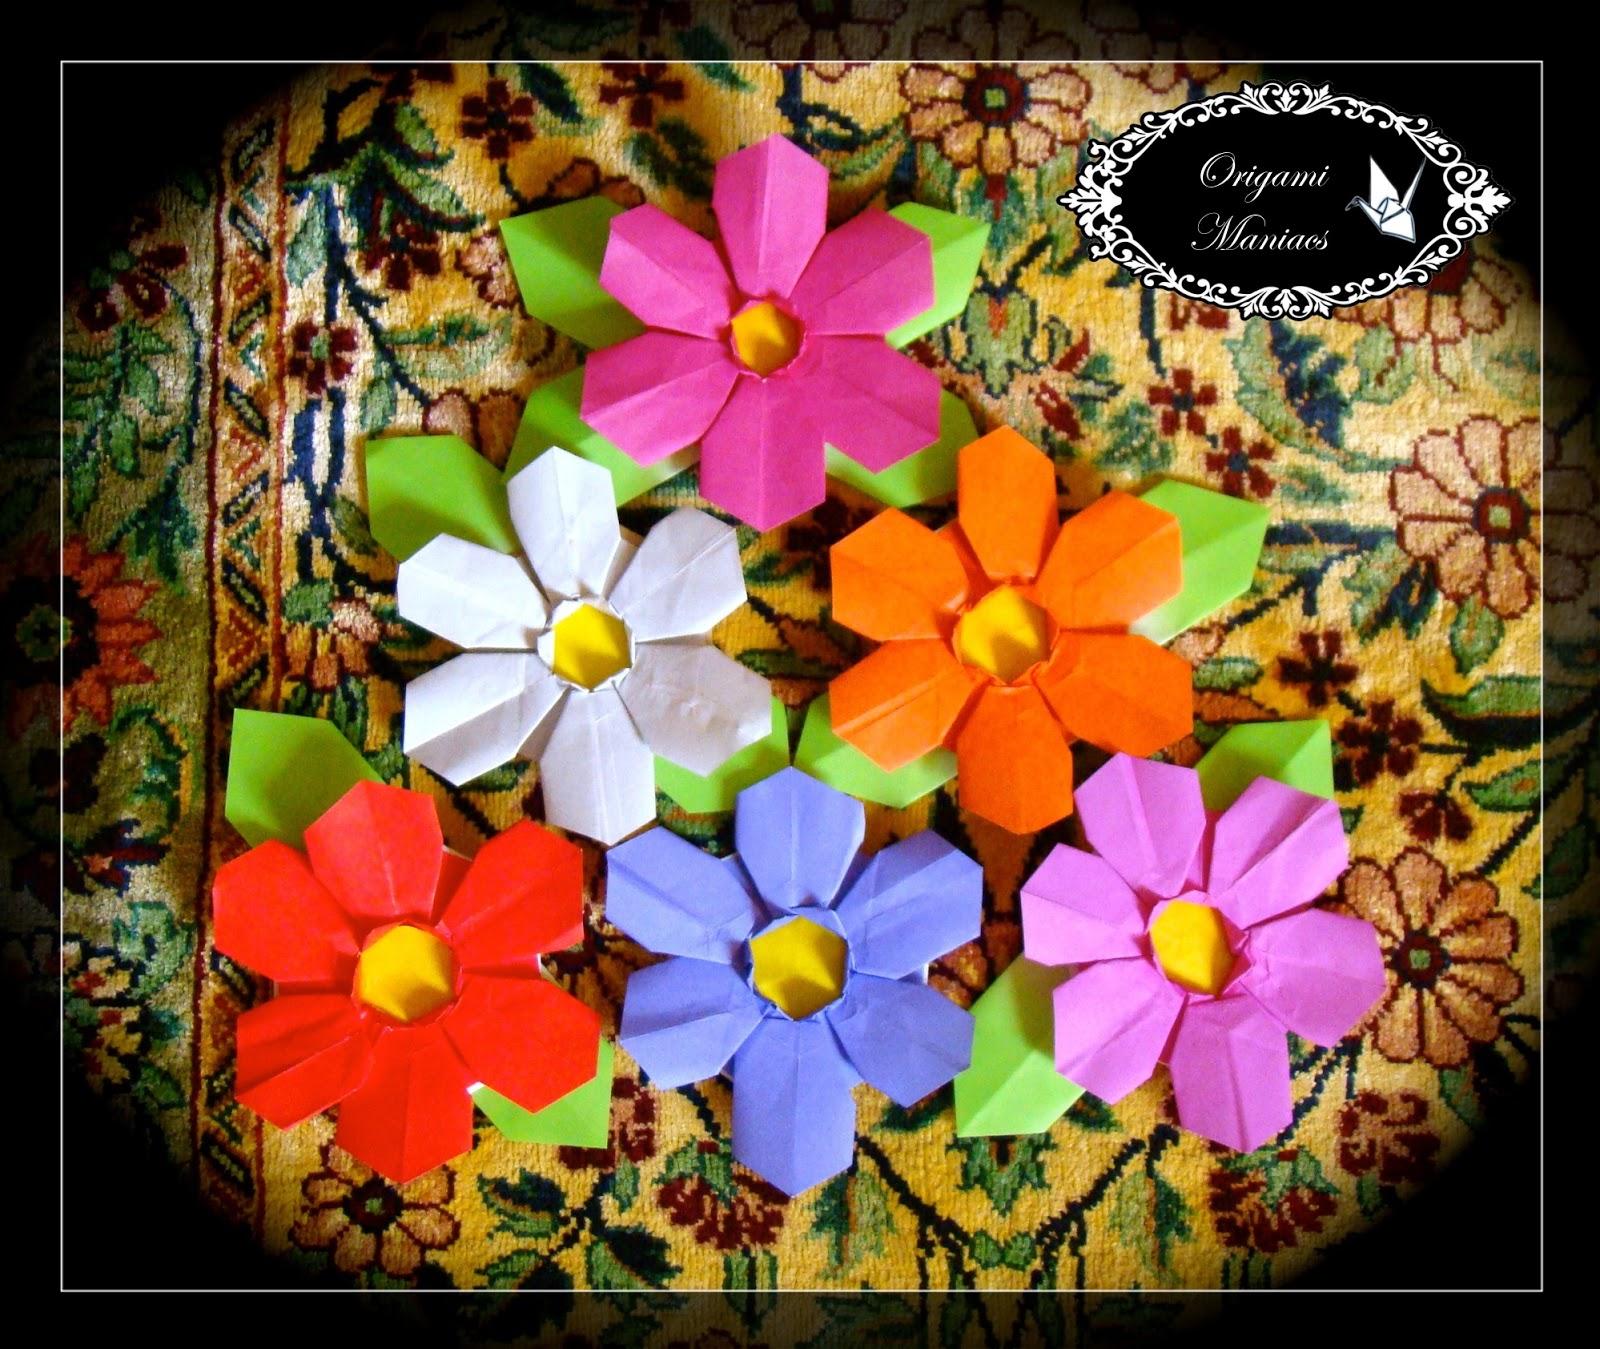 Origami Maniacs: Flor de Origami de 6 Petalos